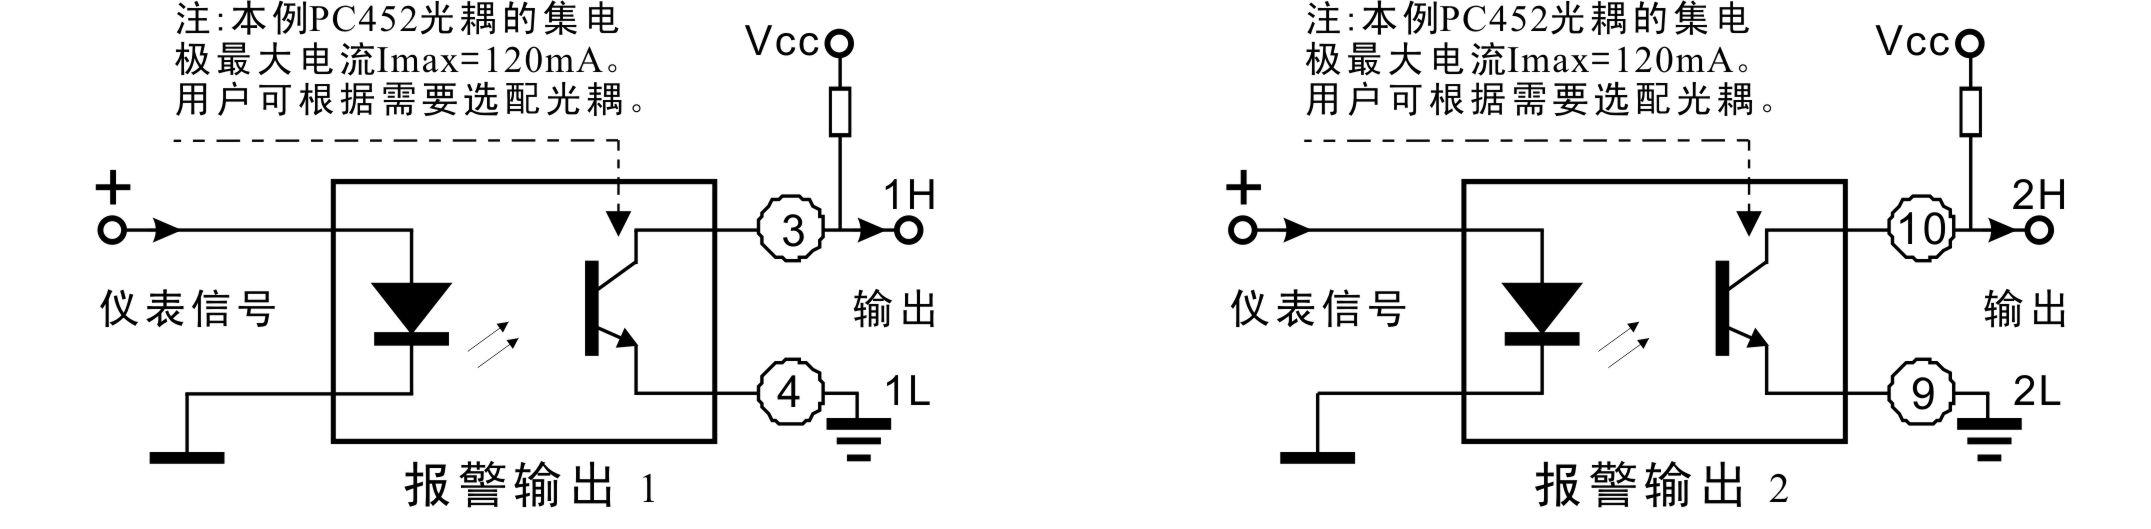 4-20ma电流环显示控制隔离器:din 1x1 iso 4-20ma(led1).